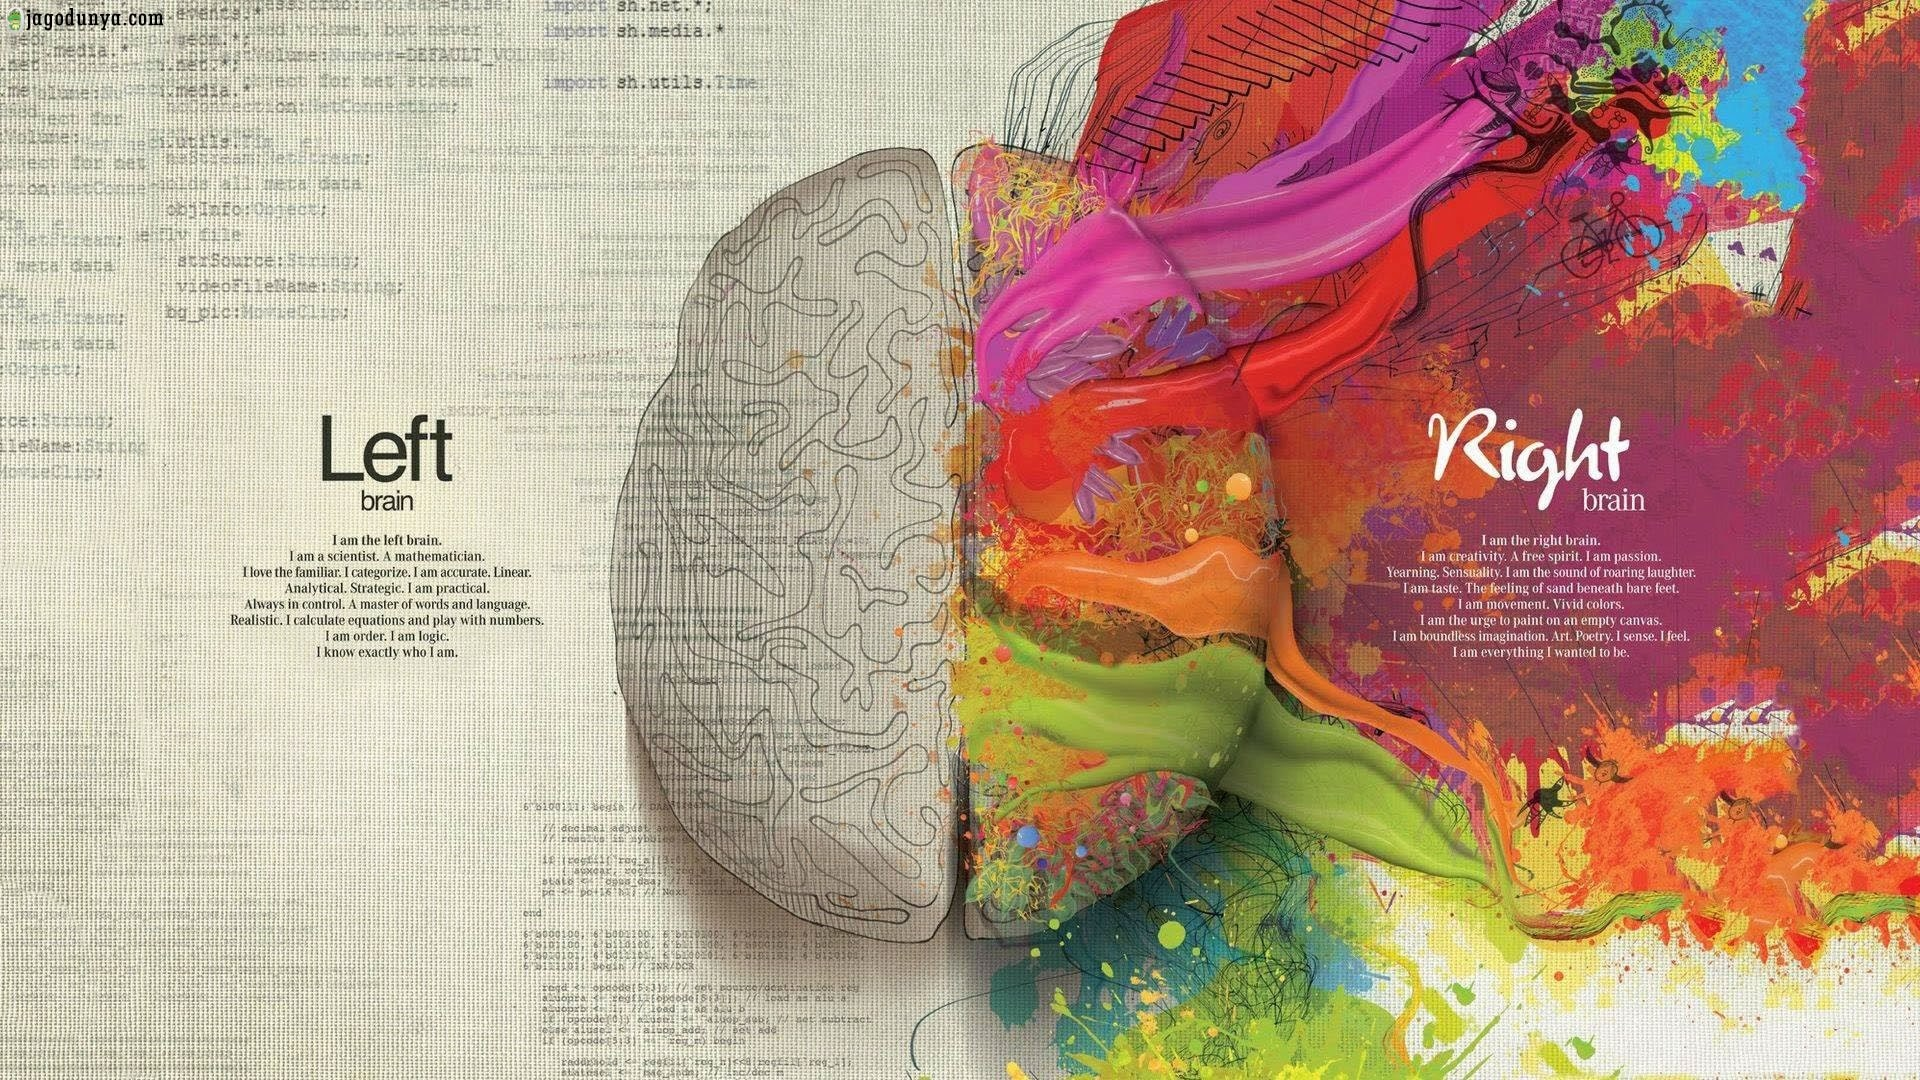 59 Inspirational Desktop Backgrounds Download Free Stunning